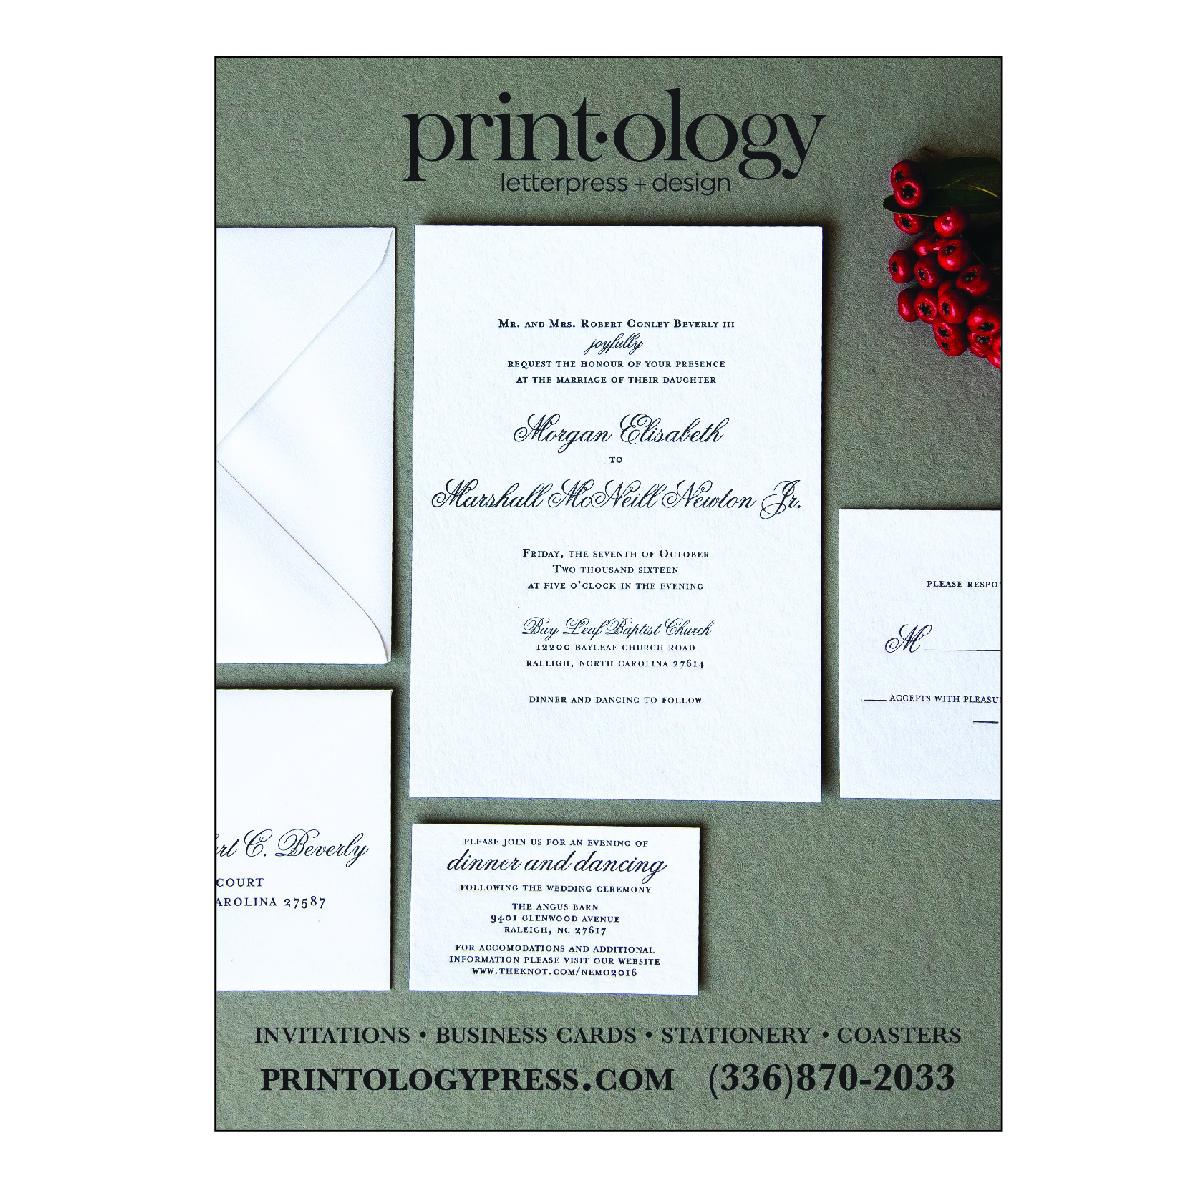 printologyad-01.jpg